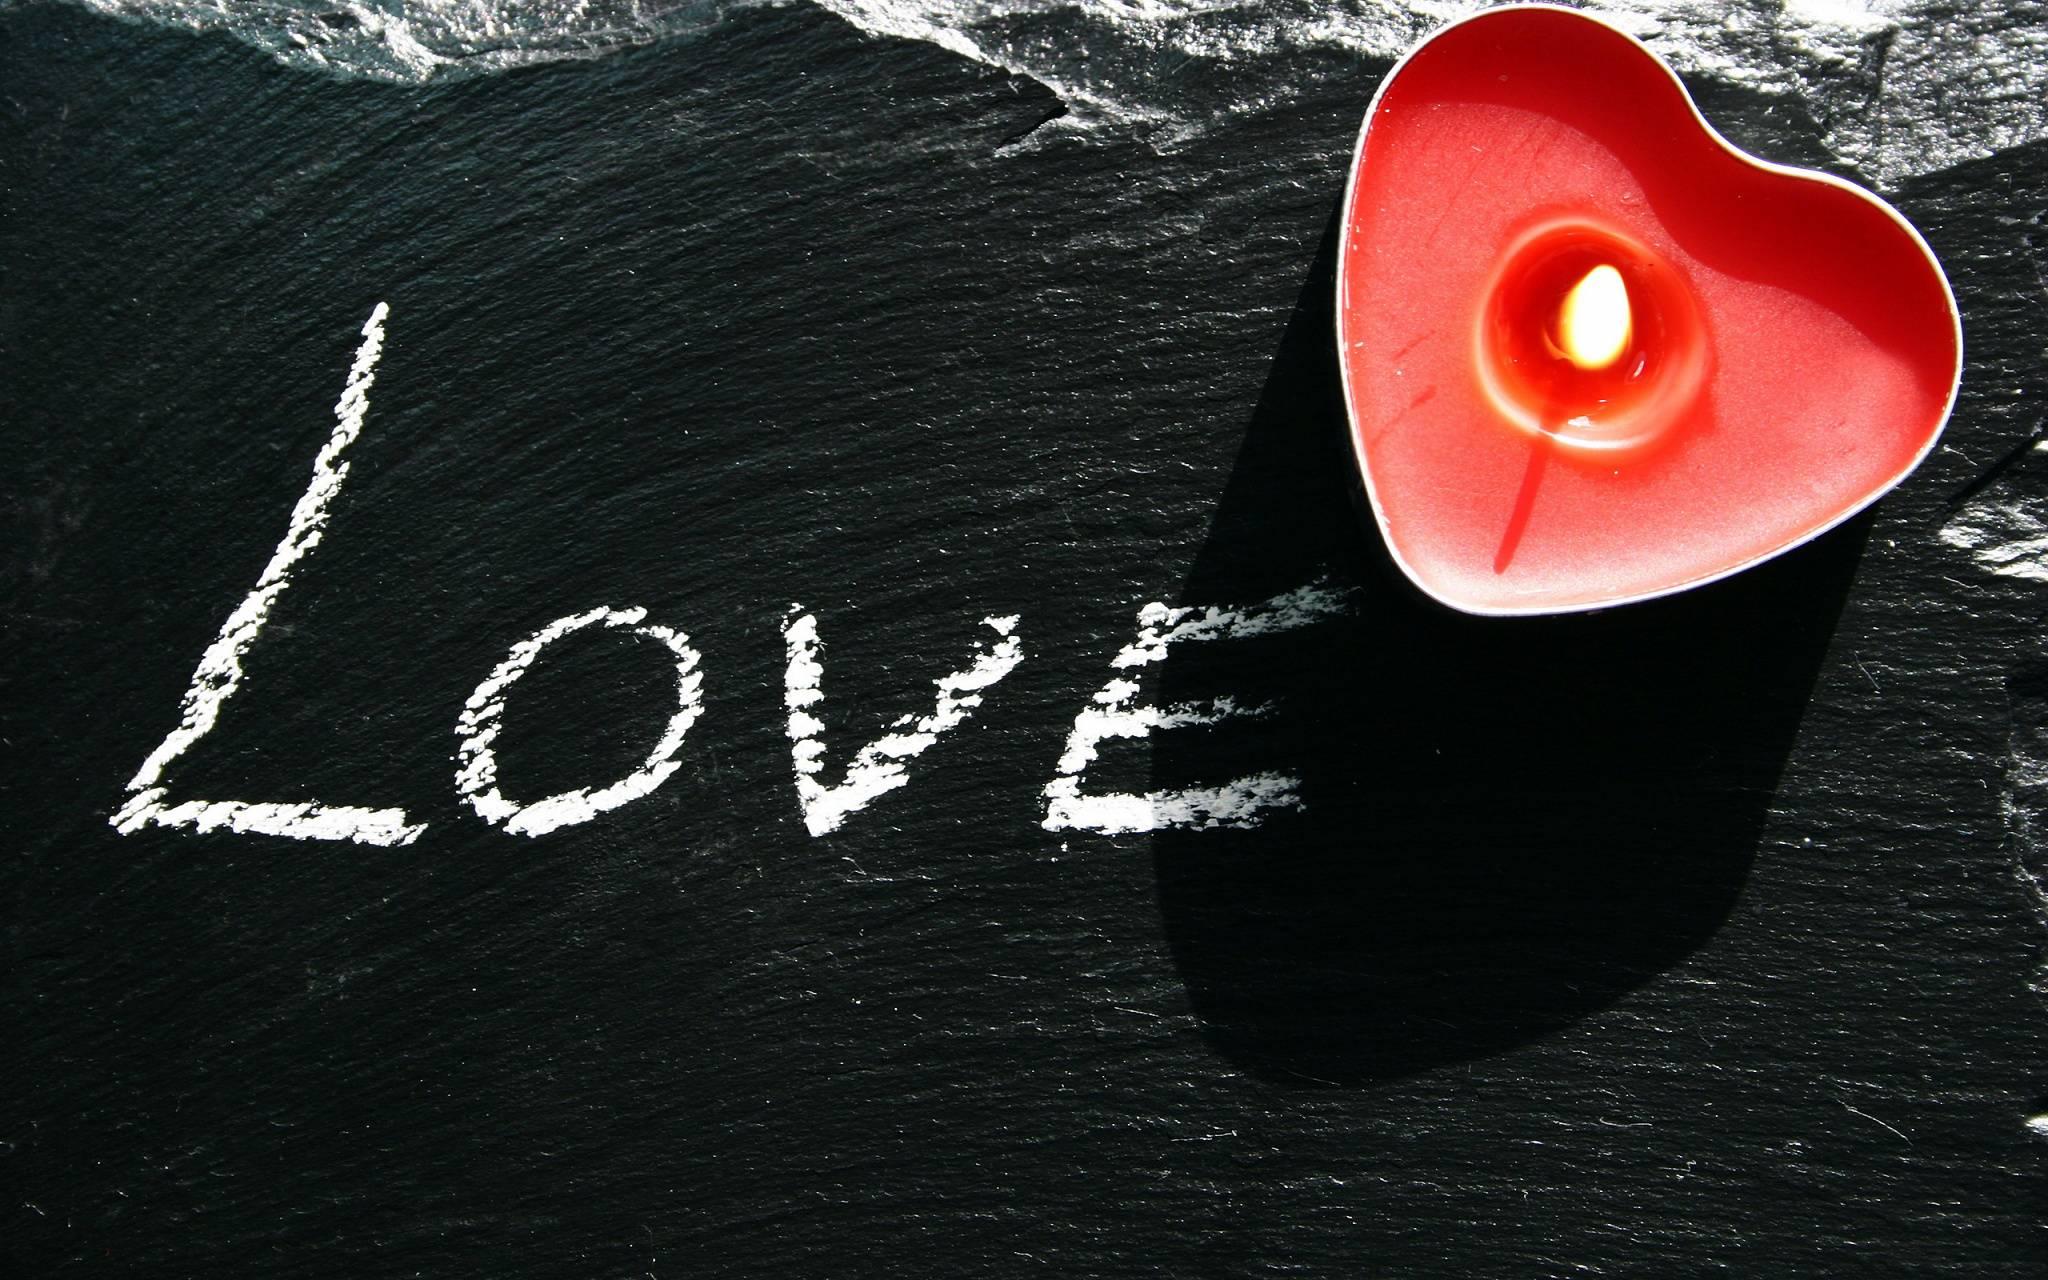 Картинки с надписями любви